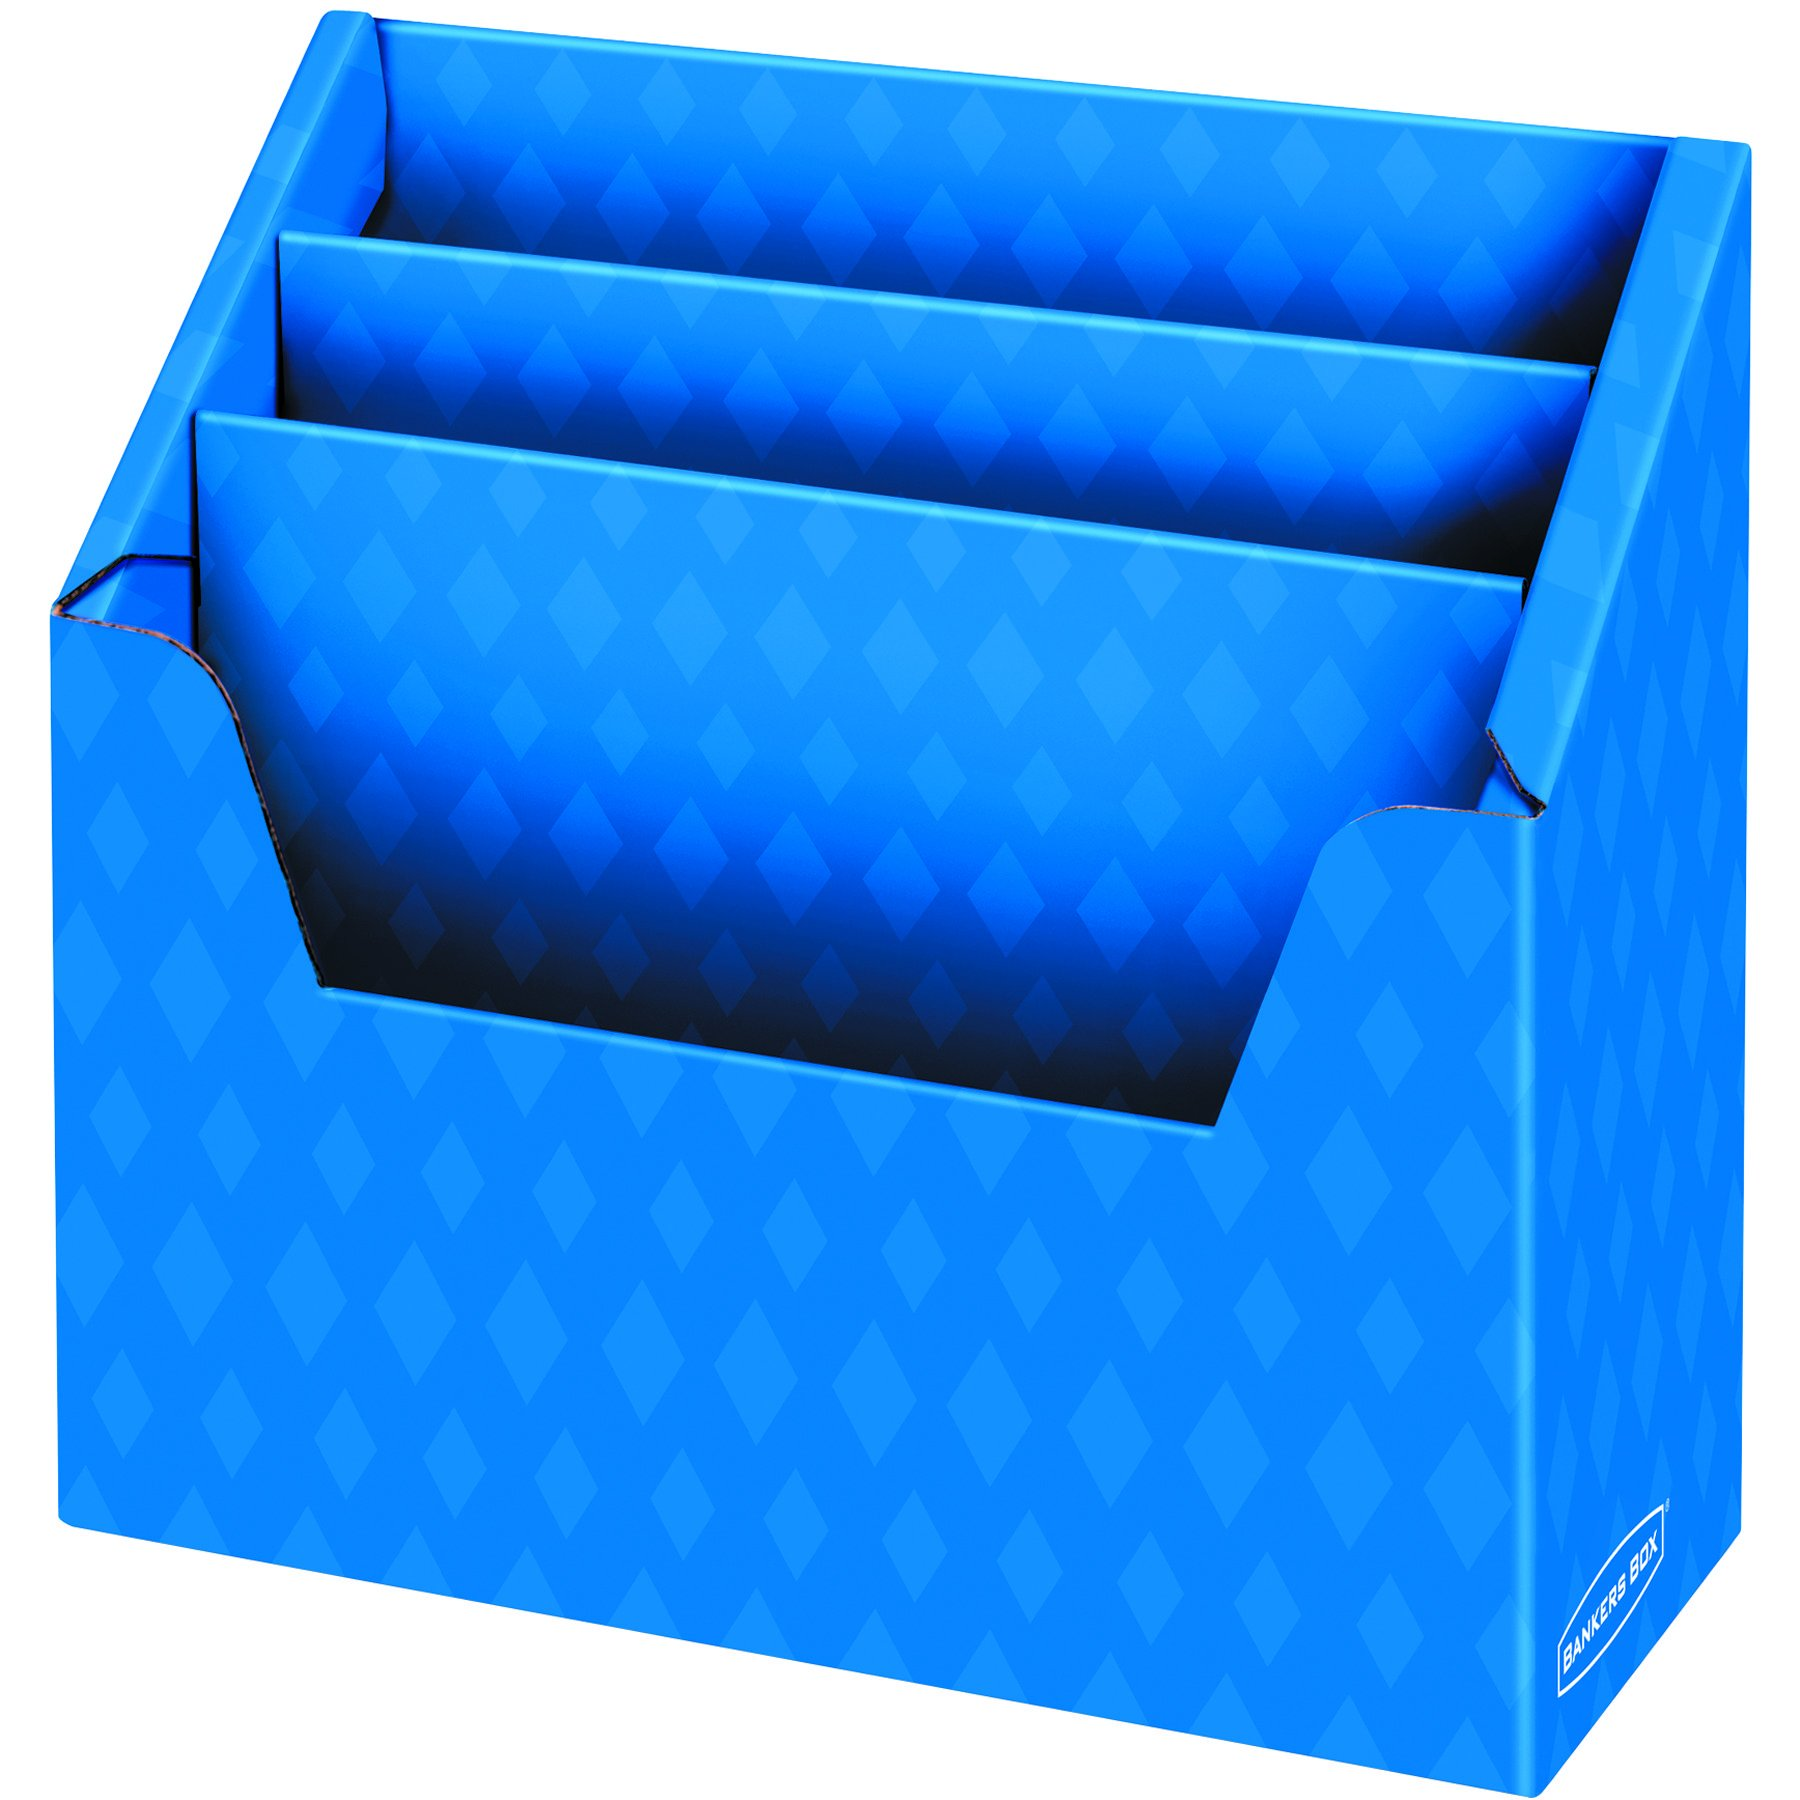 3 Compartment Folder Holder, 12''H x 13 3/4''W x 5 5/8''D, Blue